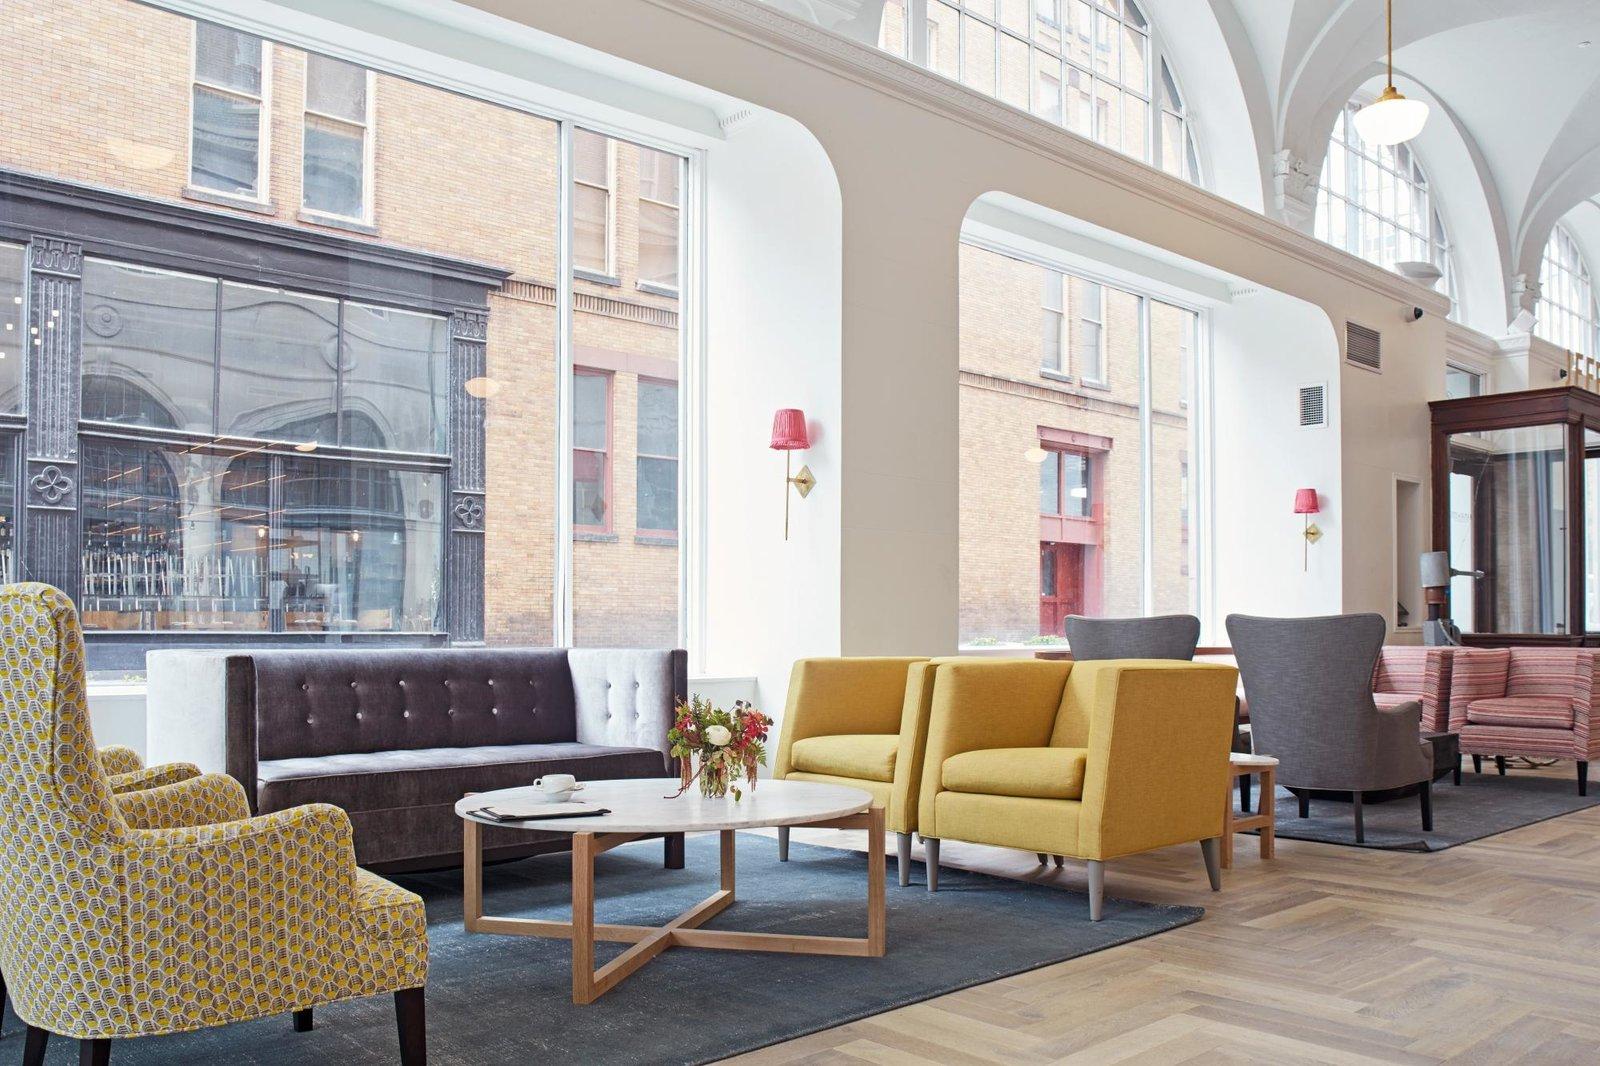 Living Room, Rug Floor, Chair, Sofa, Coffee Tables, Pendant Lighting, Medium Hardwood Floor, and Wall Lighting  Quirk Hotel